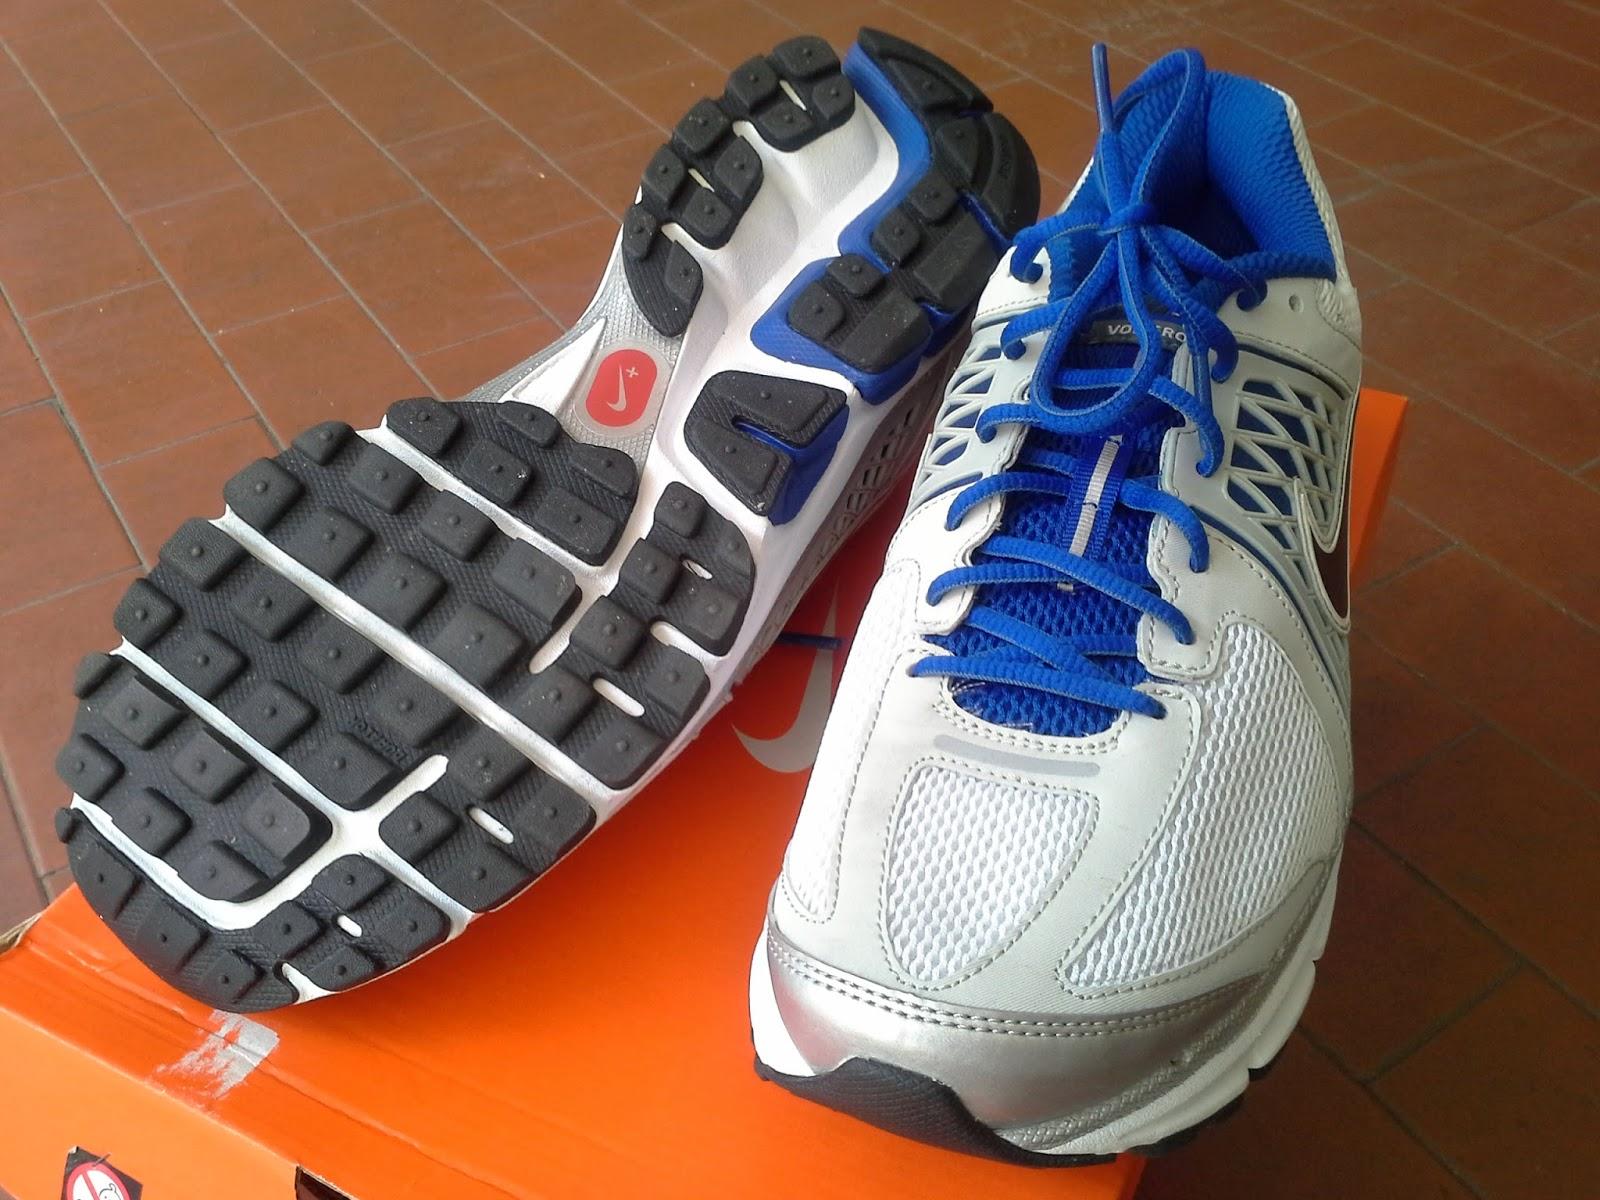 scarpe nike running con sensore